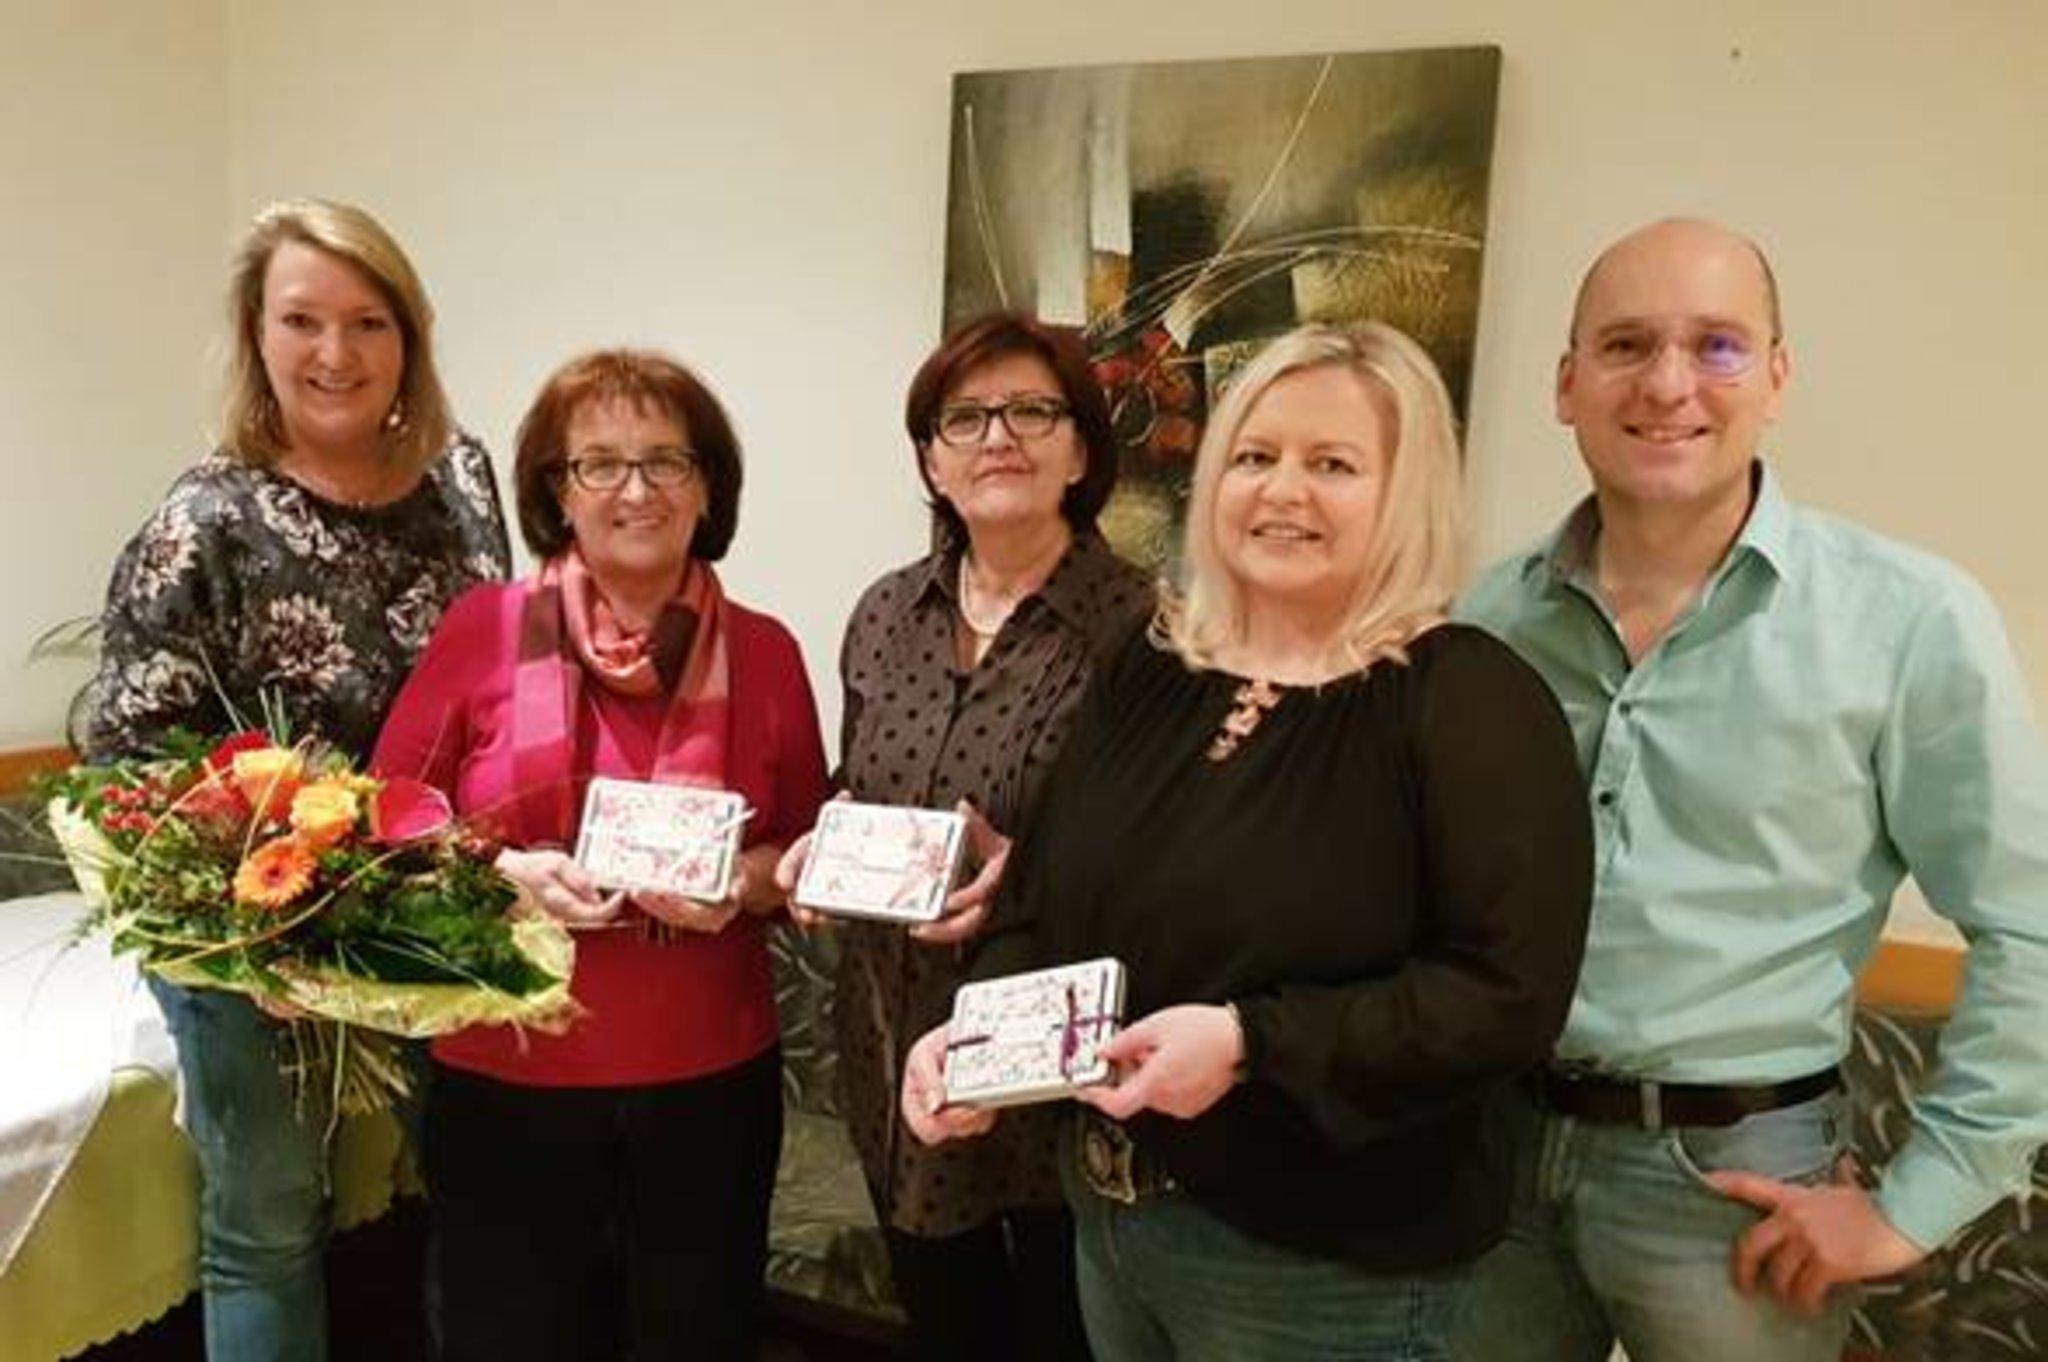 Lamprechtshausen dating portal - Wrdern partnersuche ab 60